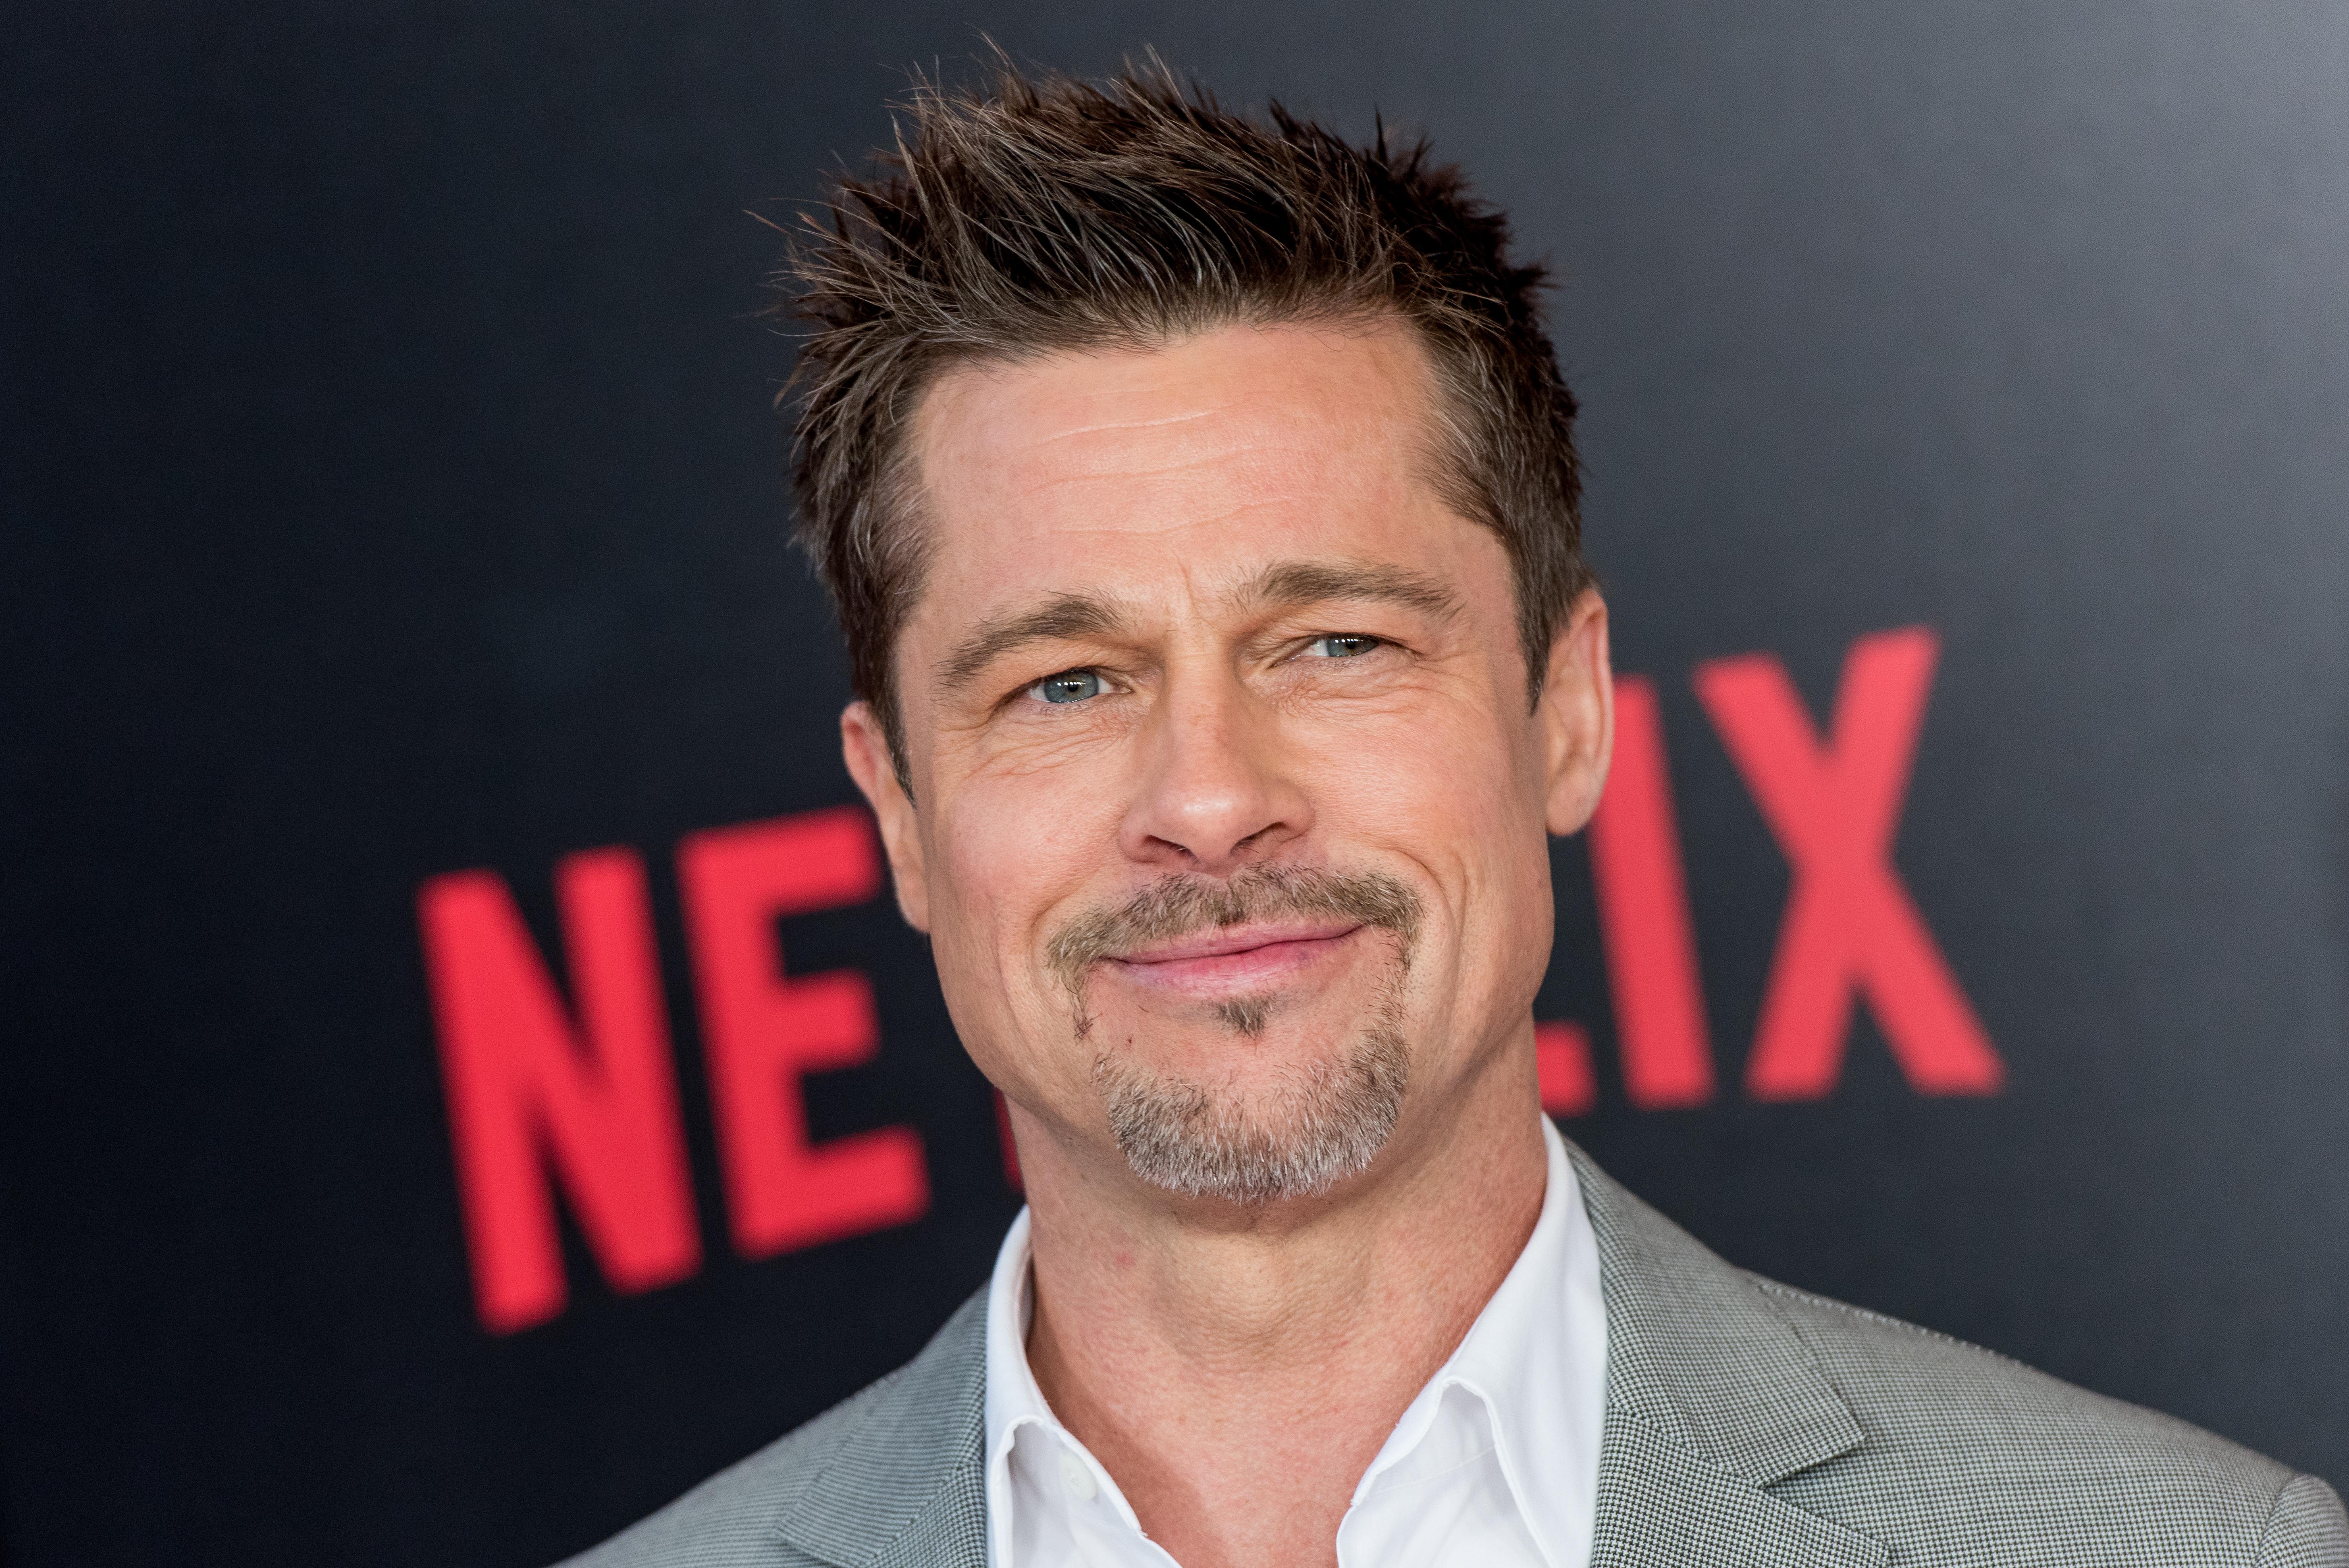 Brad Pitt attends the New York premiere of  Okja  in New York City on June 8, 2017.